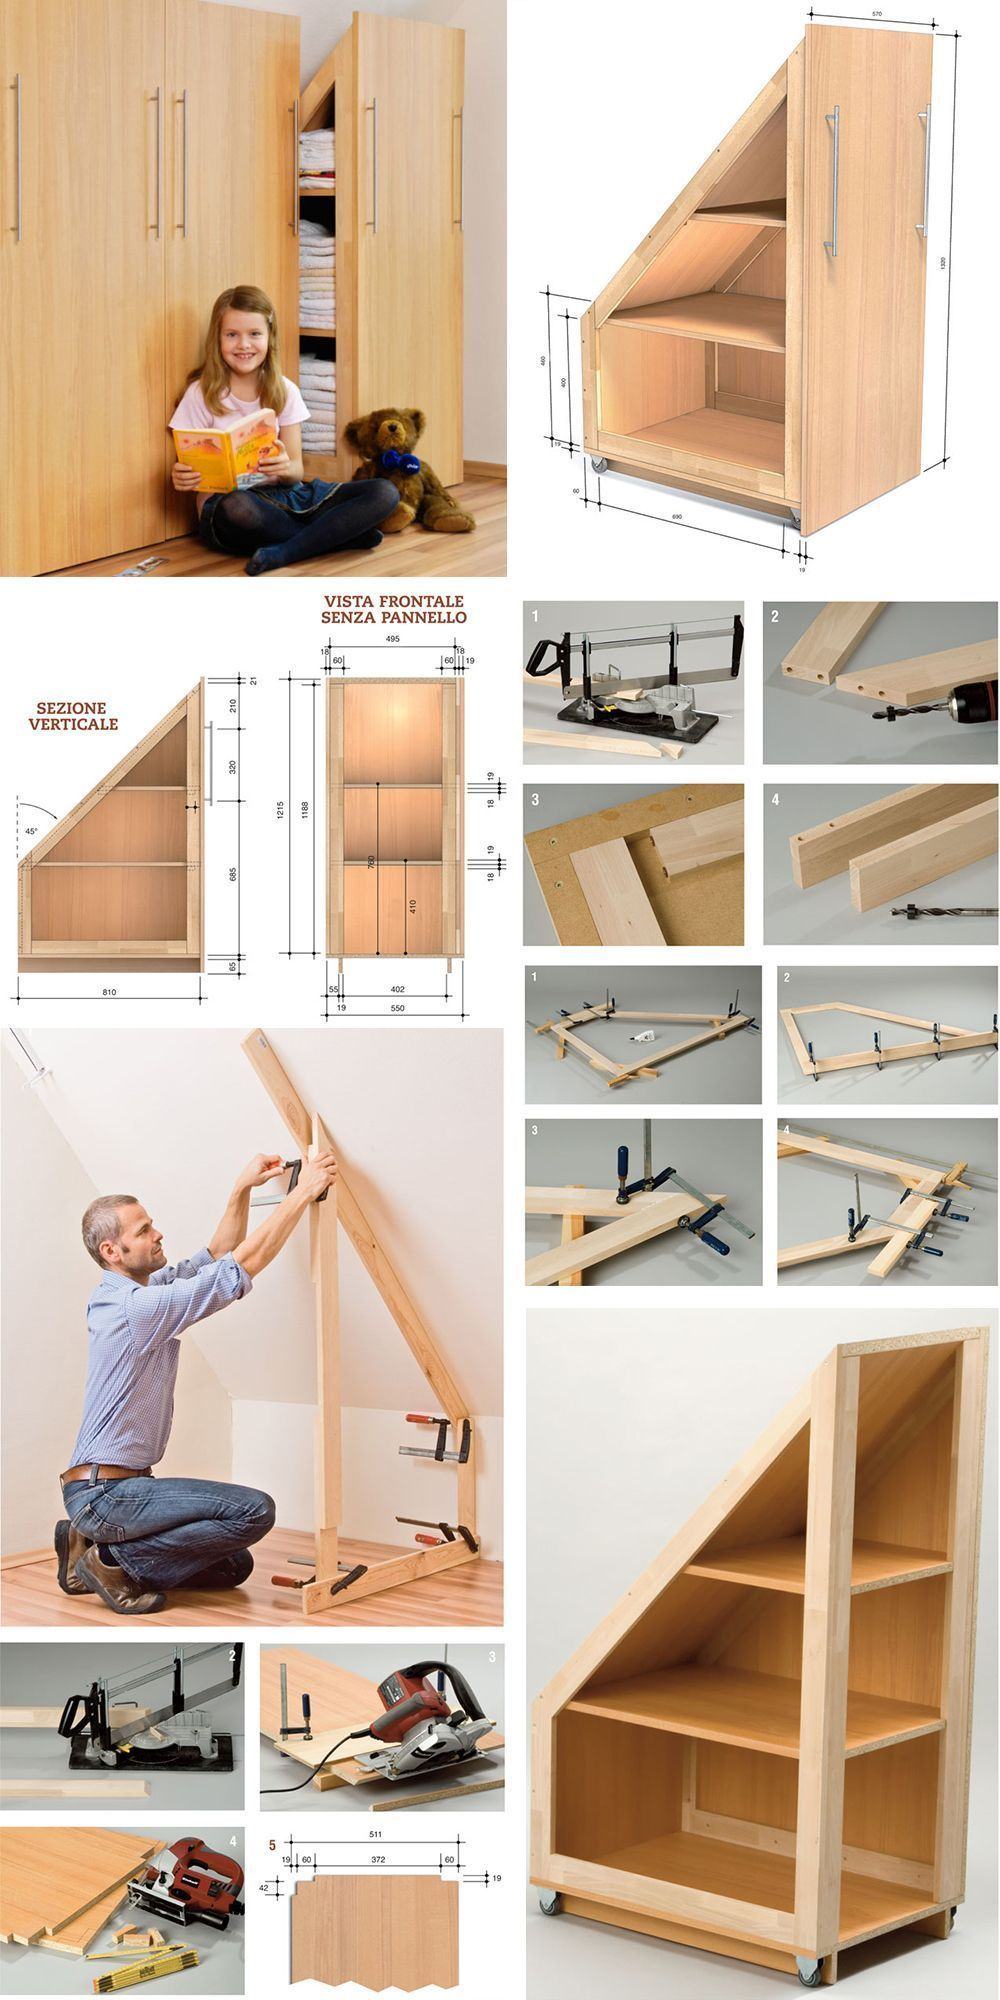 Armadio angolare fai da te Understairs Ideas angolare armadio fai – Garage Organization DIY